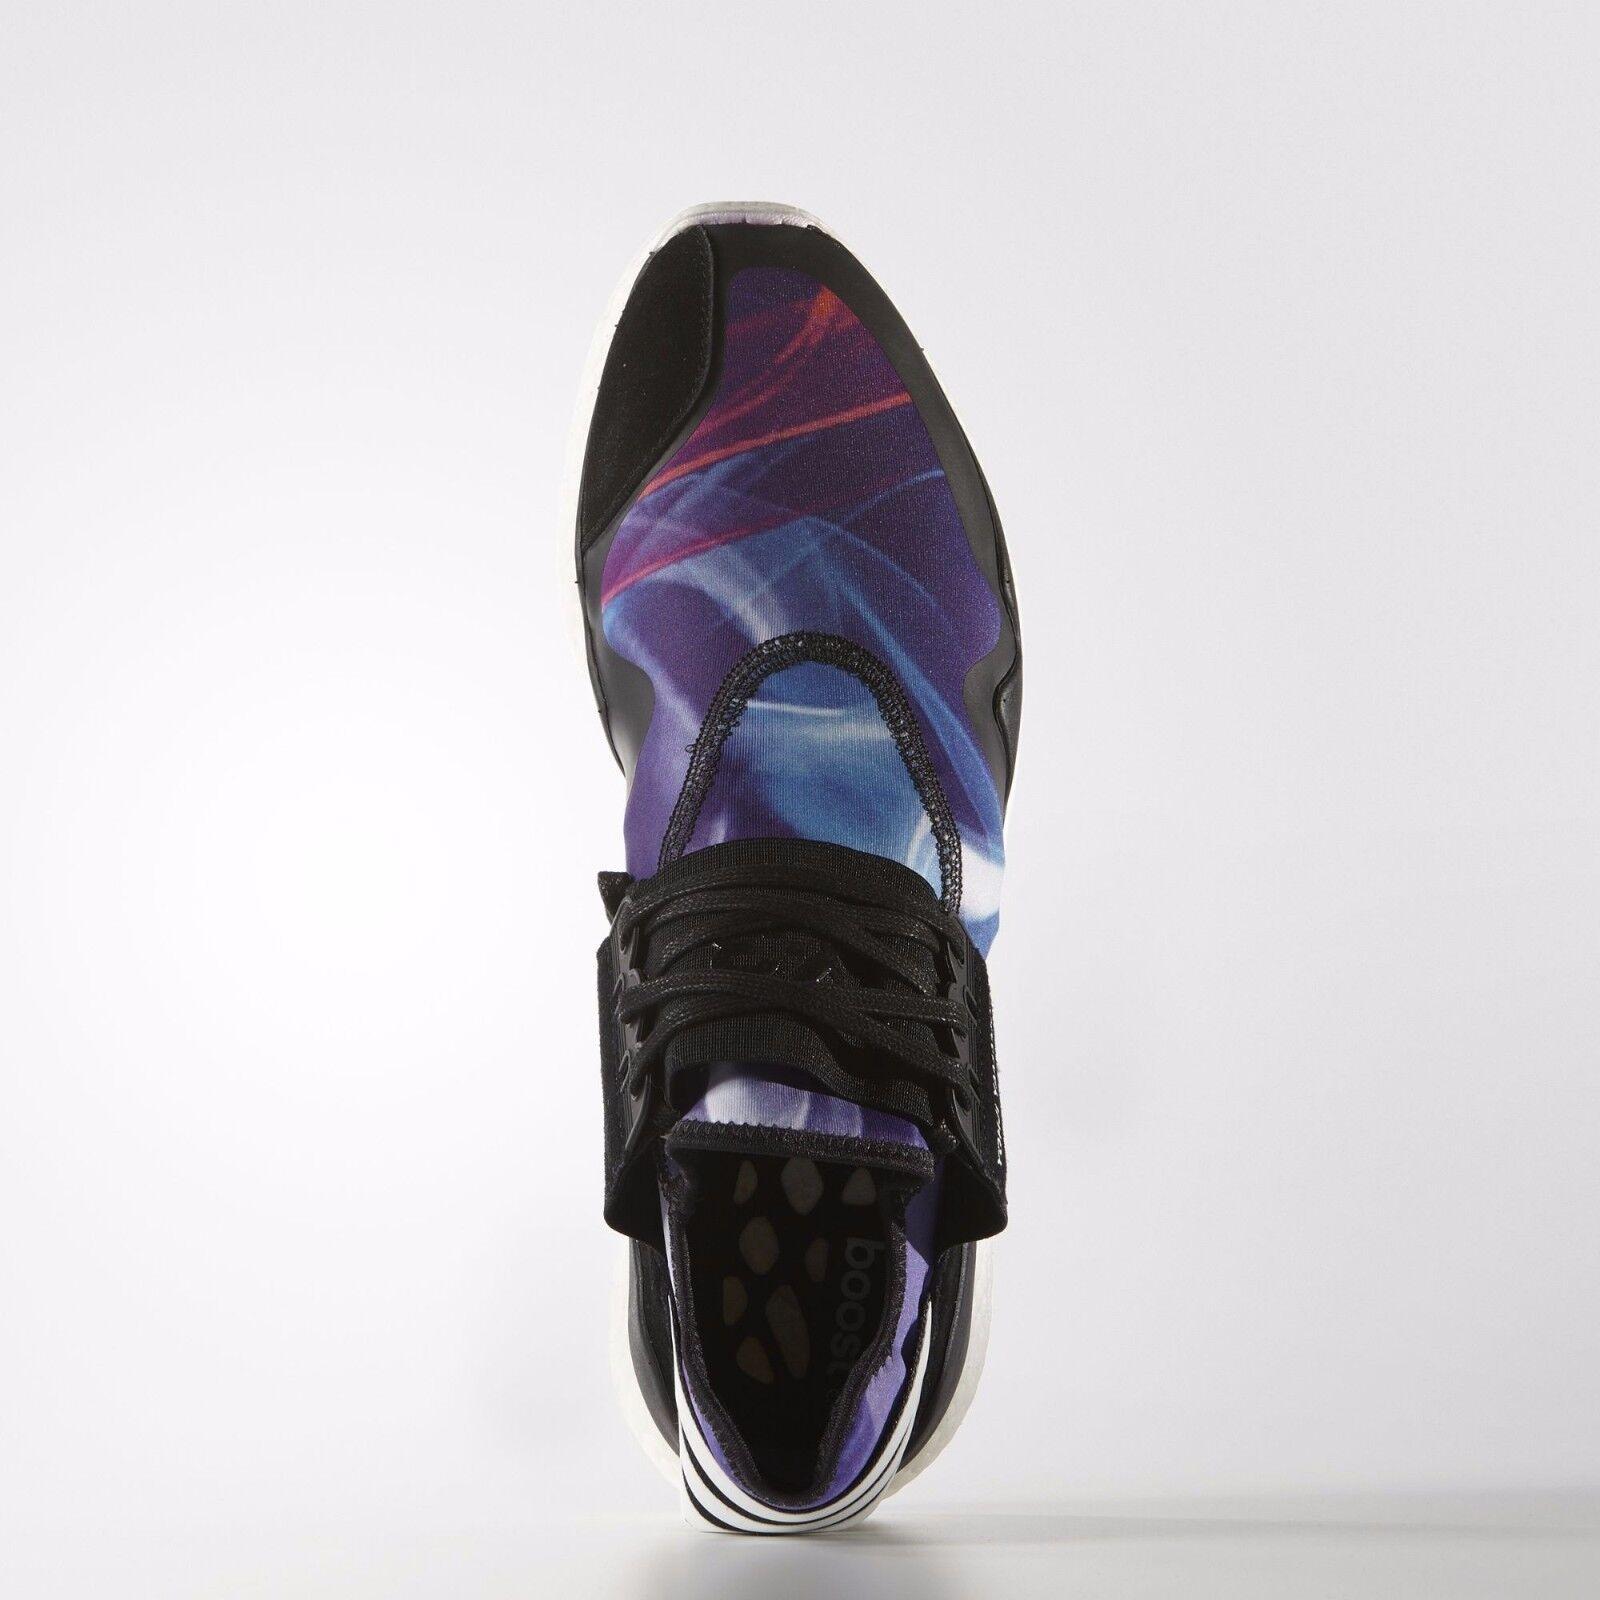 Scarpe casual da uomo  Adidas Y-3 Yohji Yamamoto Retro Boost AQ5495 Limited Edition